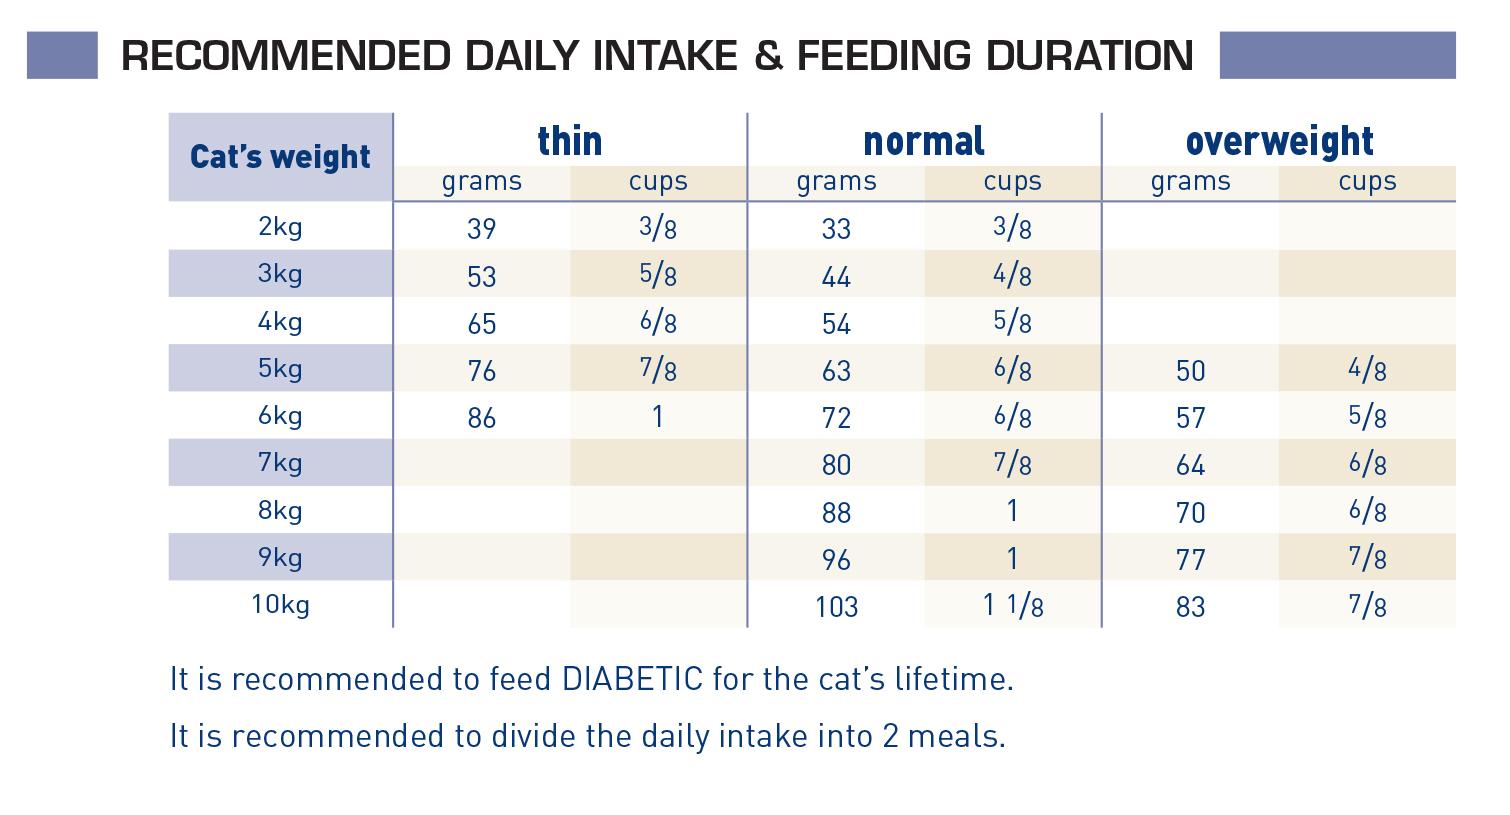 Diabetic feeding guide